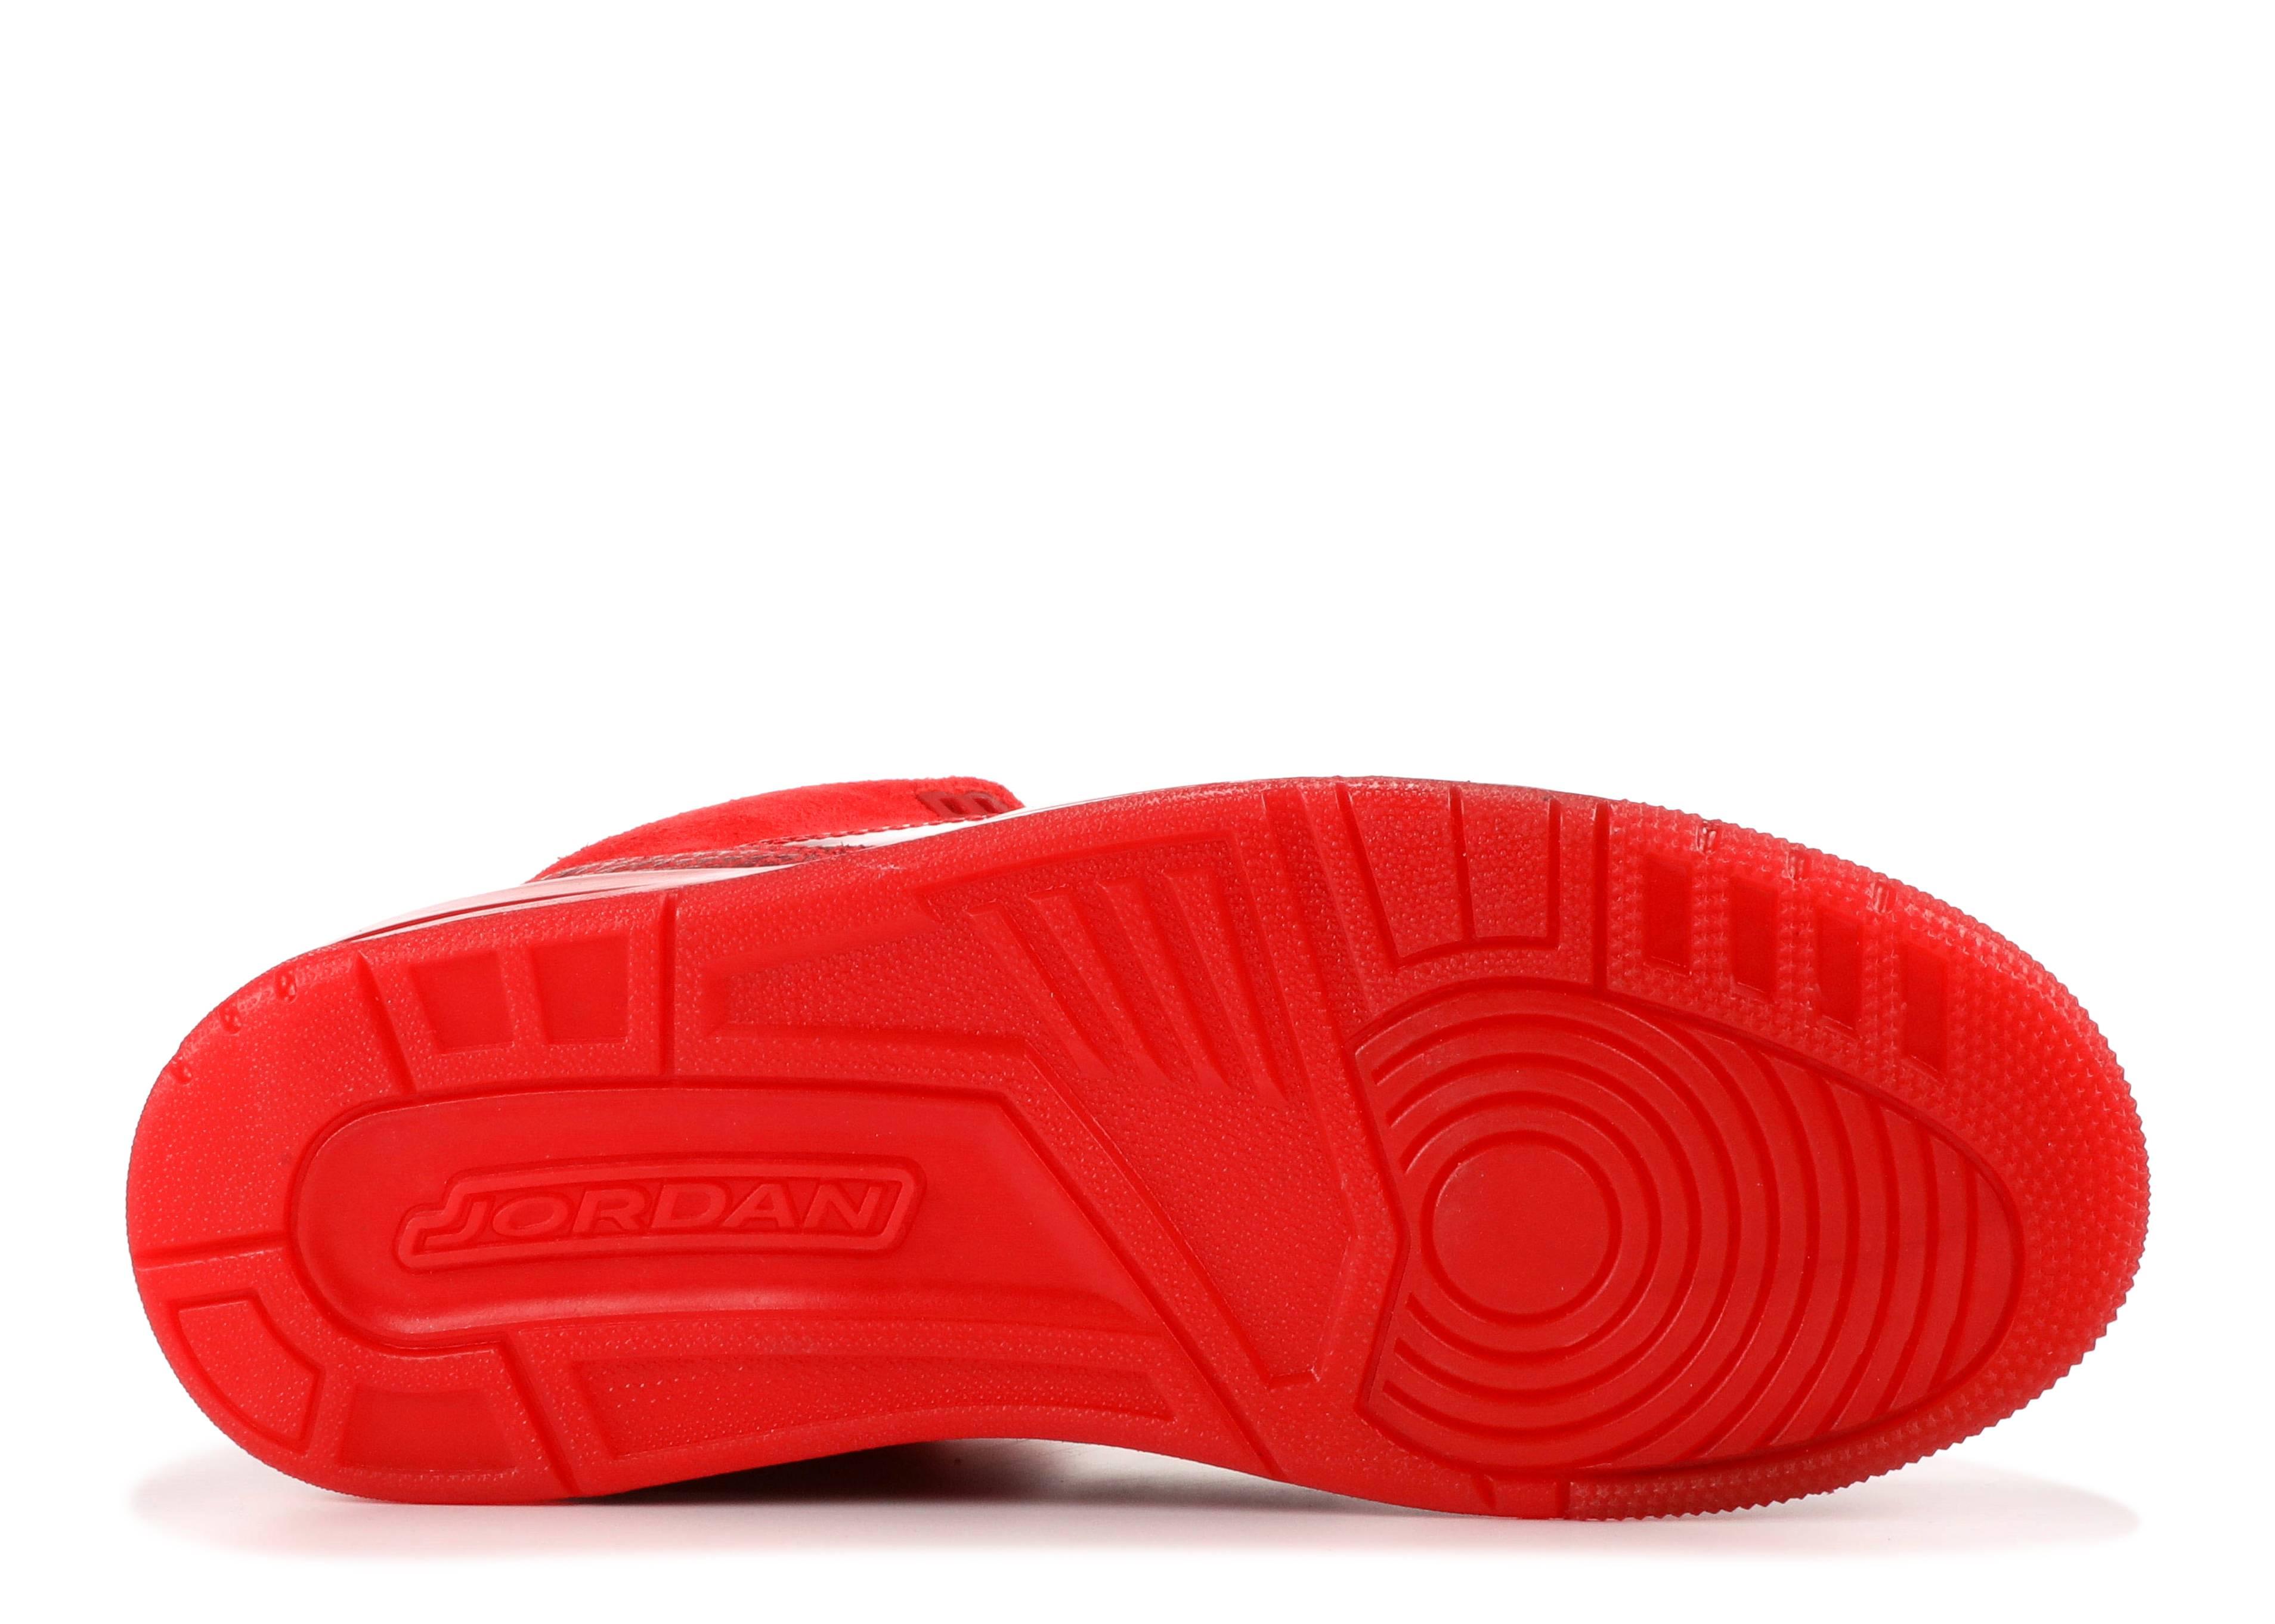 footwear 100% authentic super quality Air jordan 3